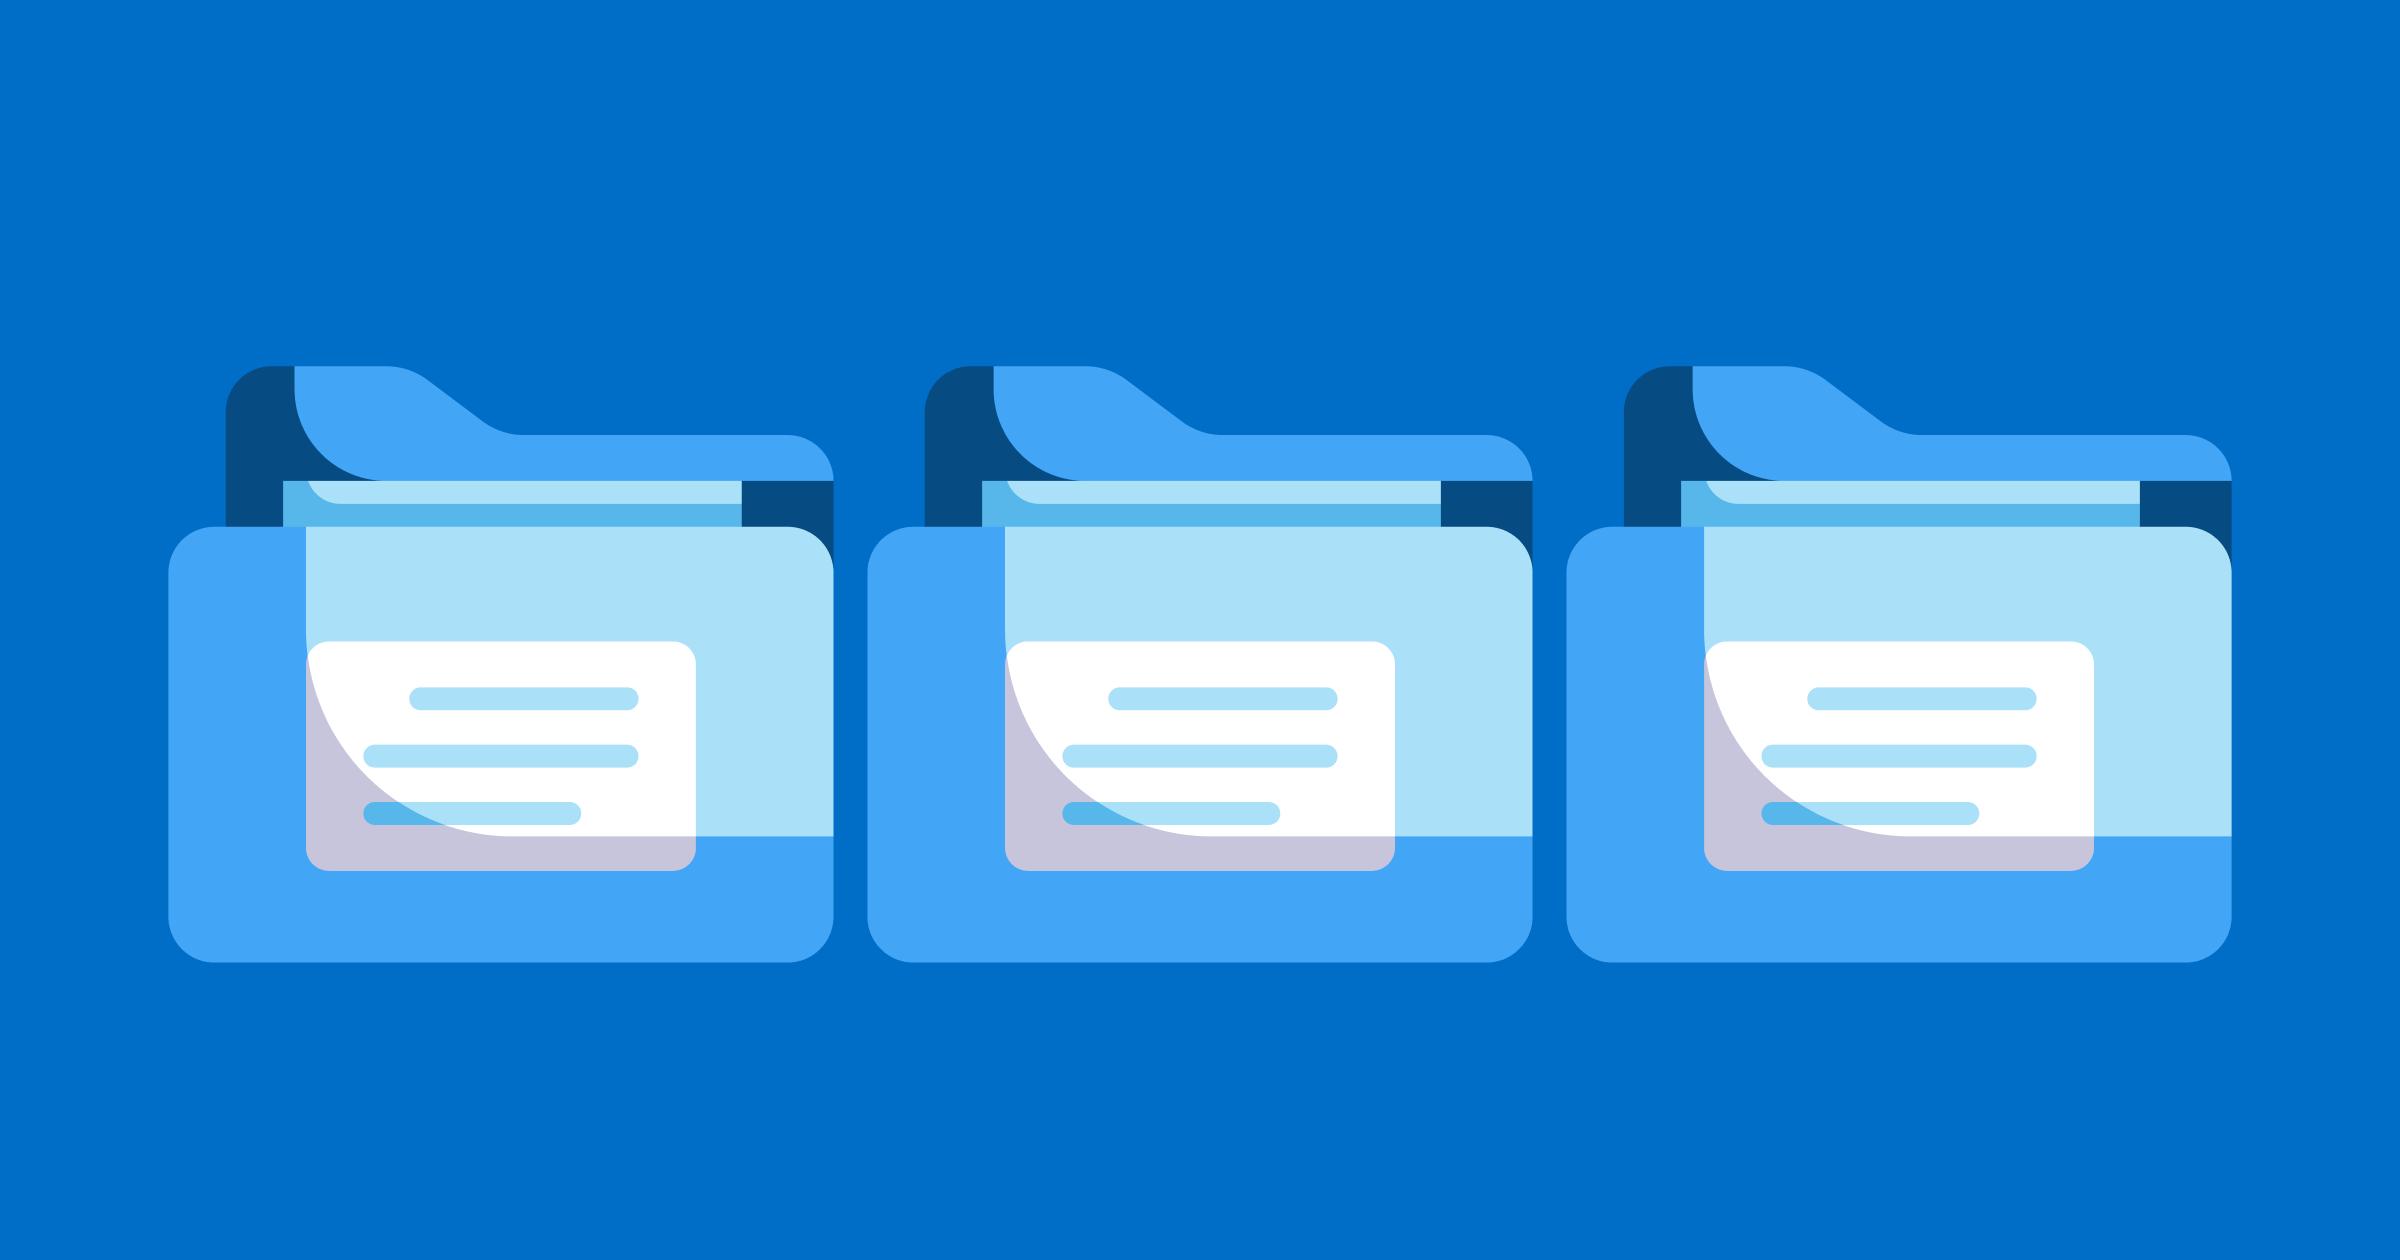 Top Tips For Organising Design Files